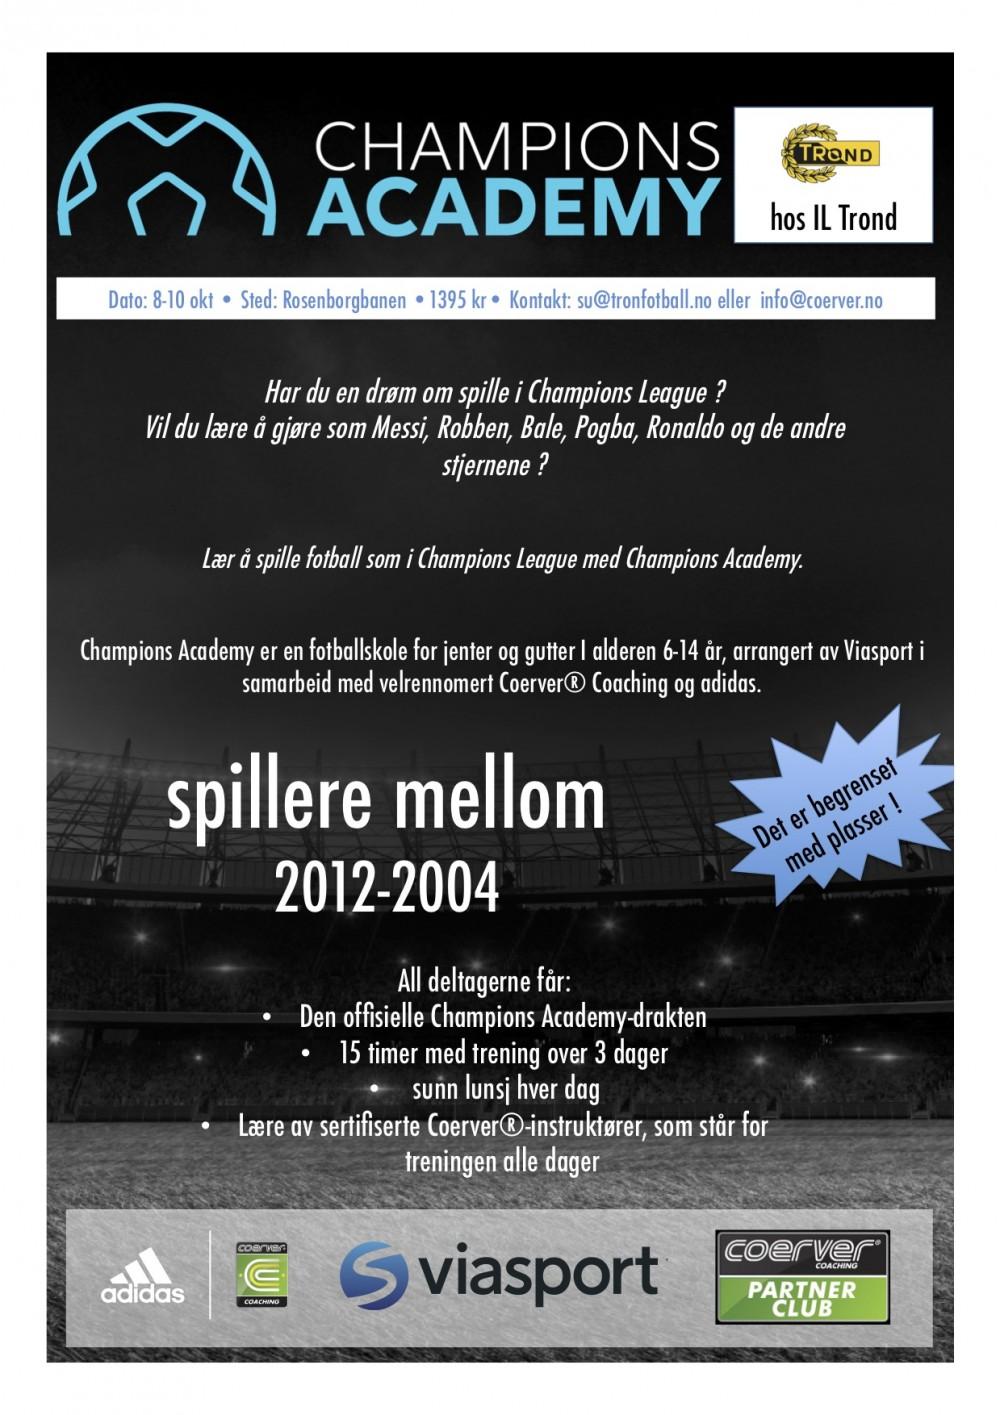 Champions Academy hos IL Trond SK  uke 41